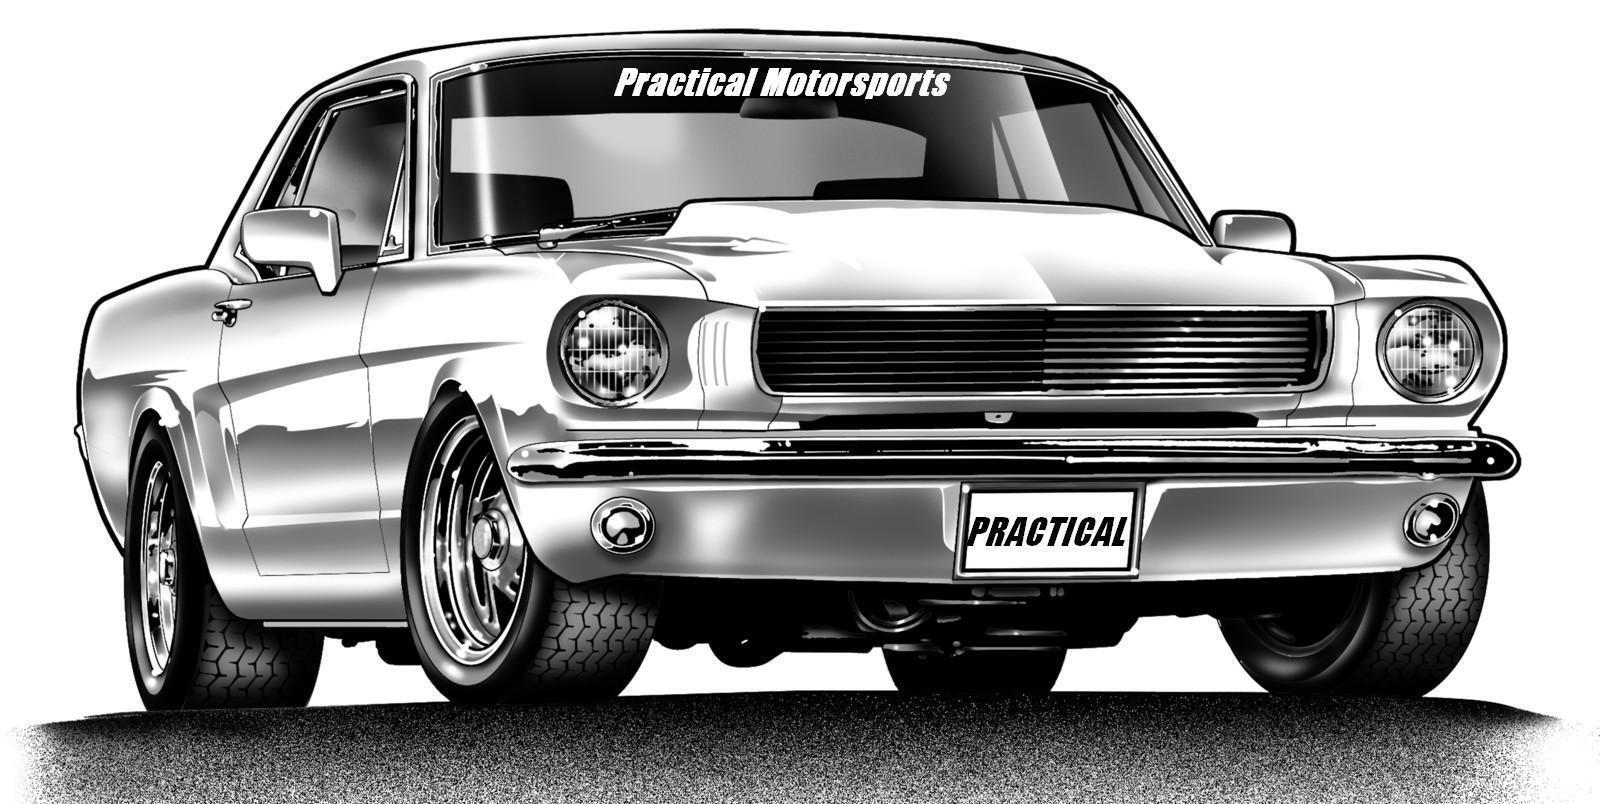 Practical Motorsports